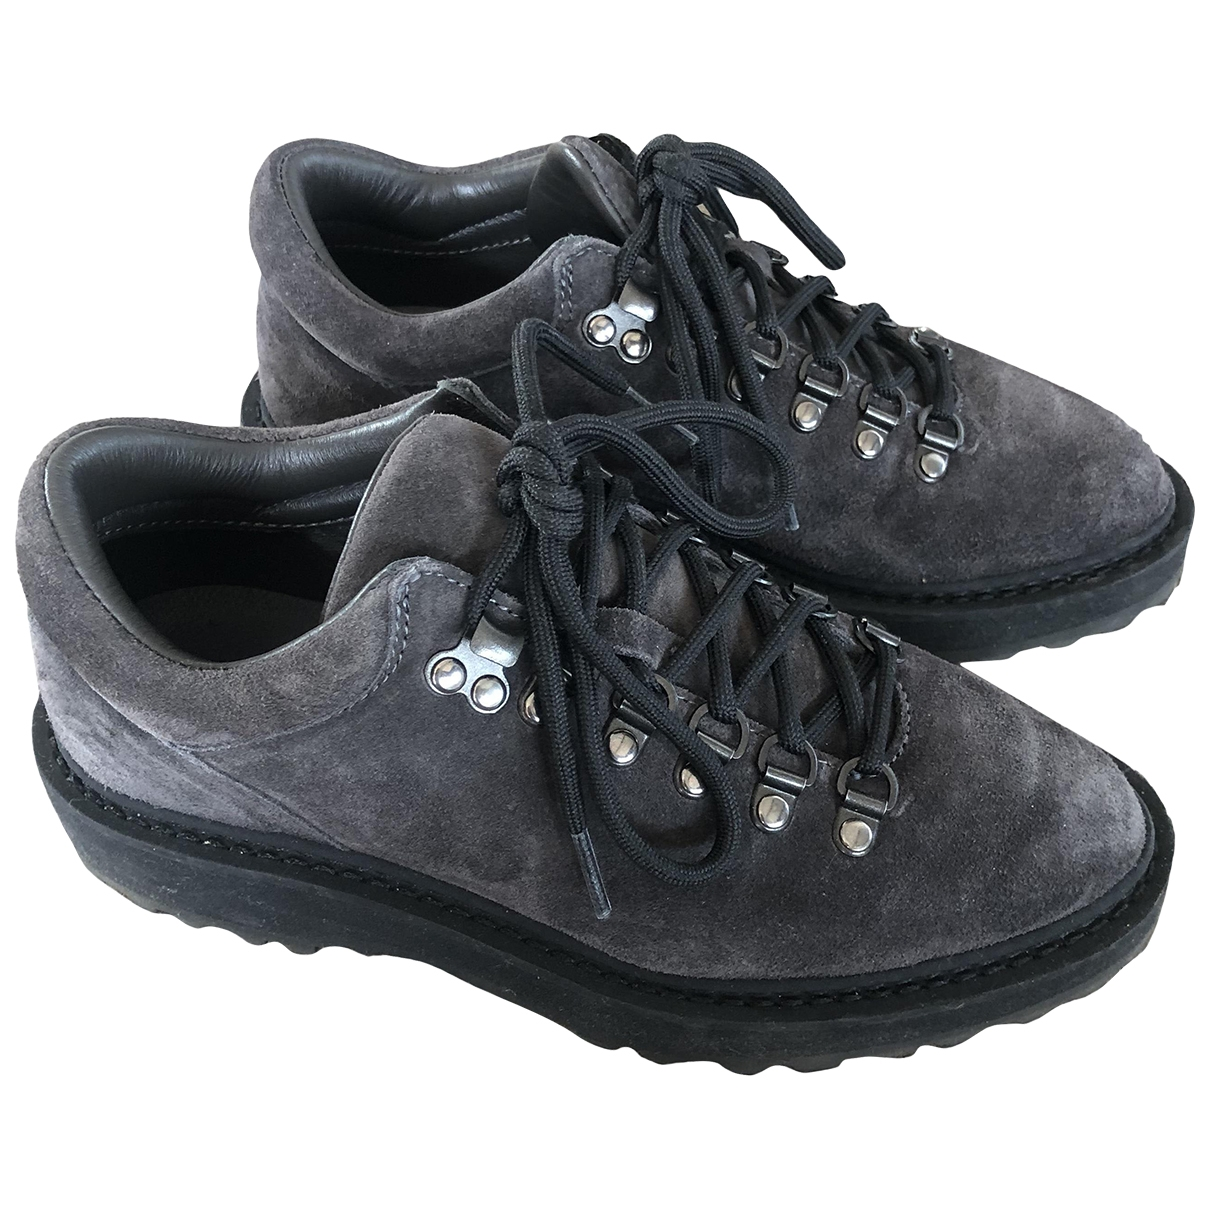 Nanushka - Boots   pour femme en suede - anthracite